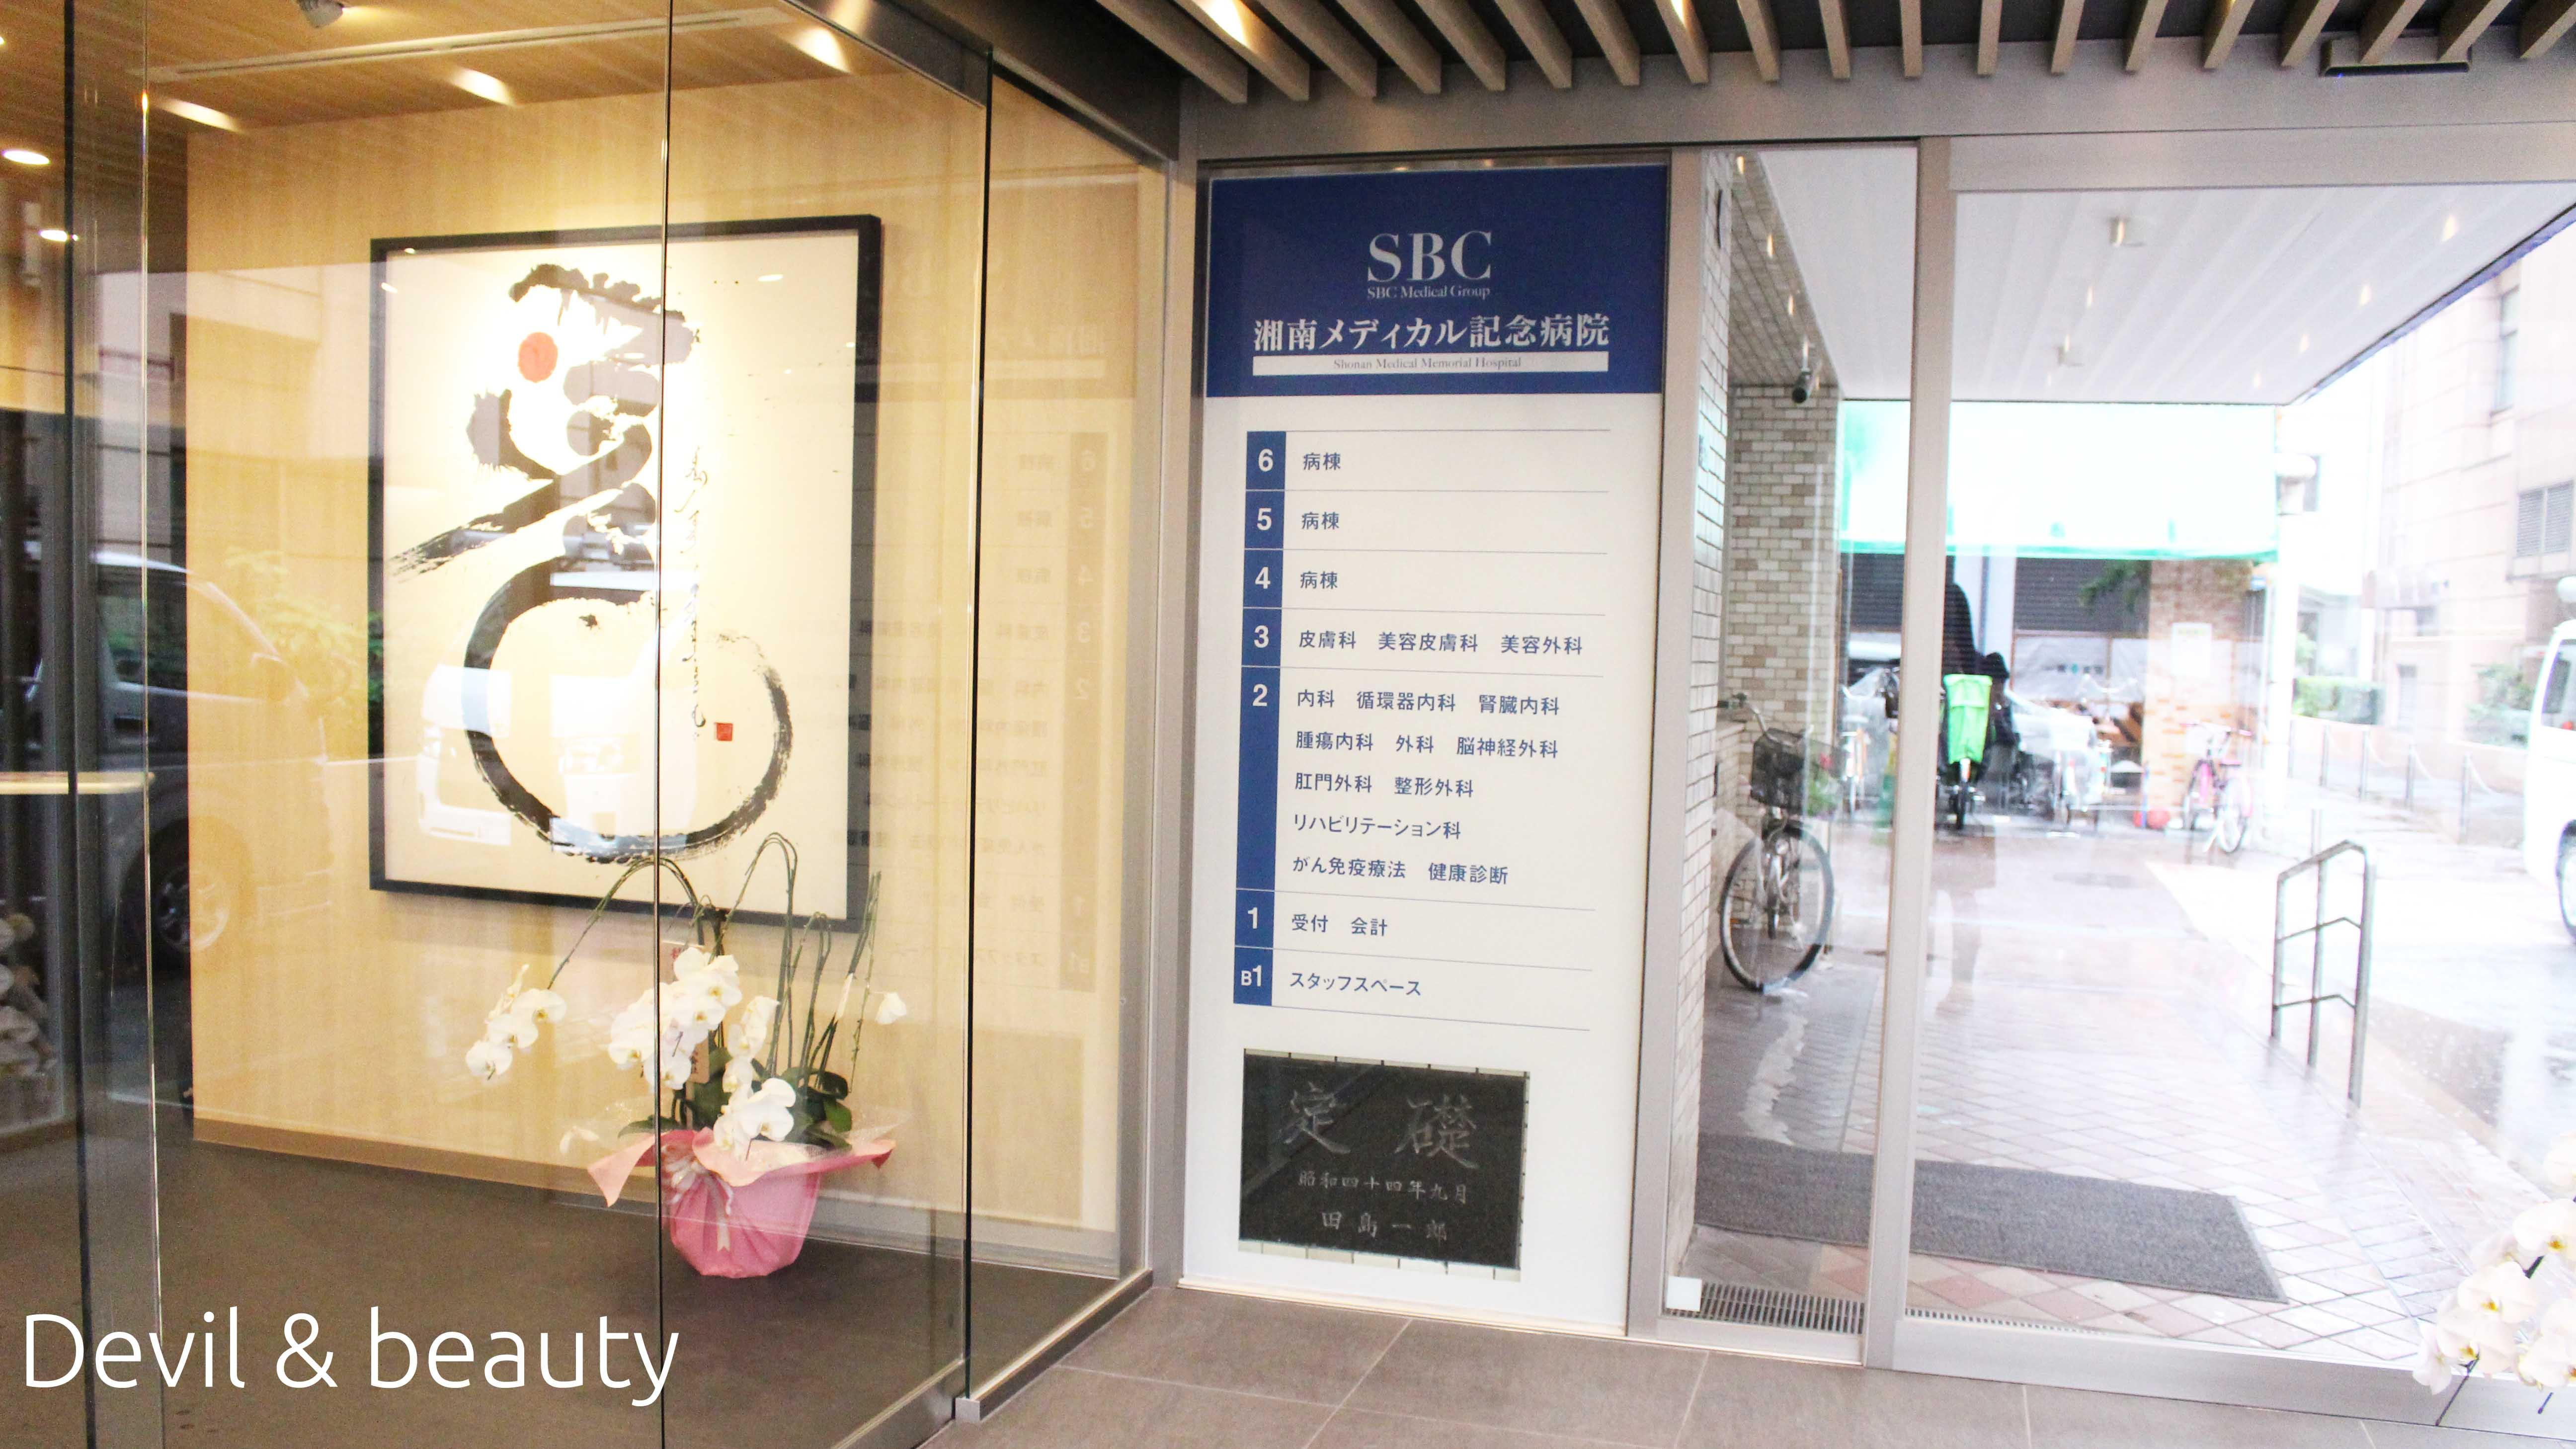 shonan-cosmetic-surgery-ryogoku3 - image